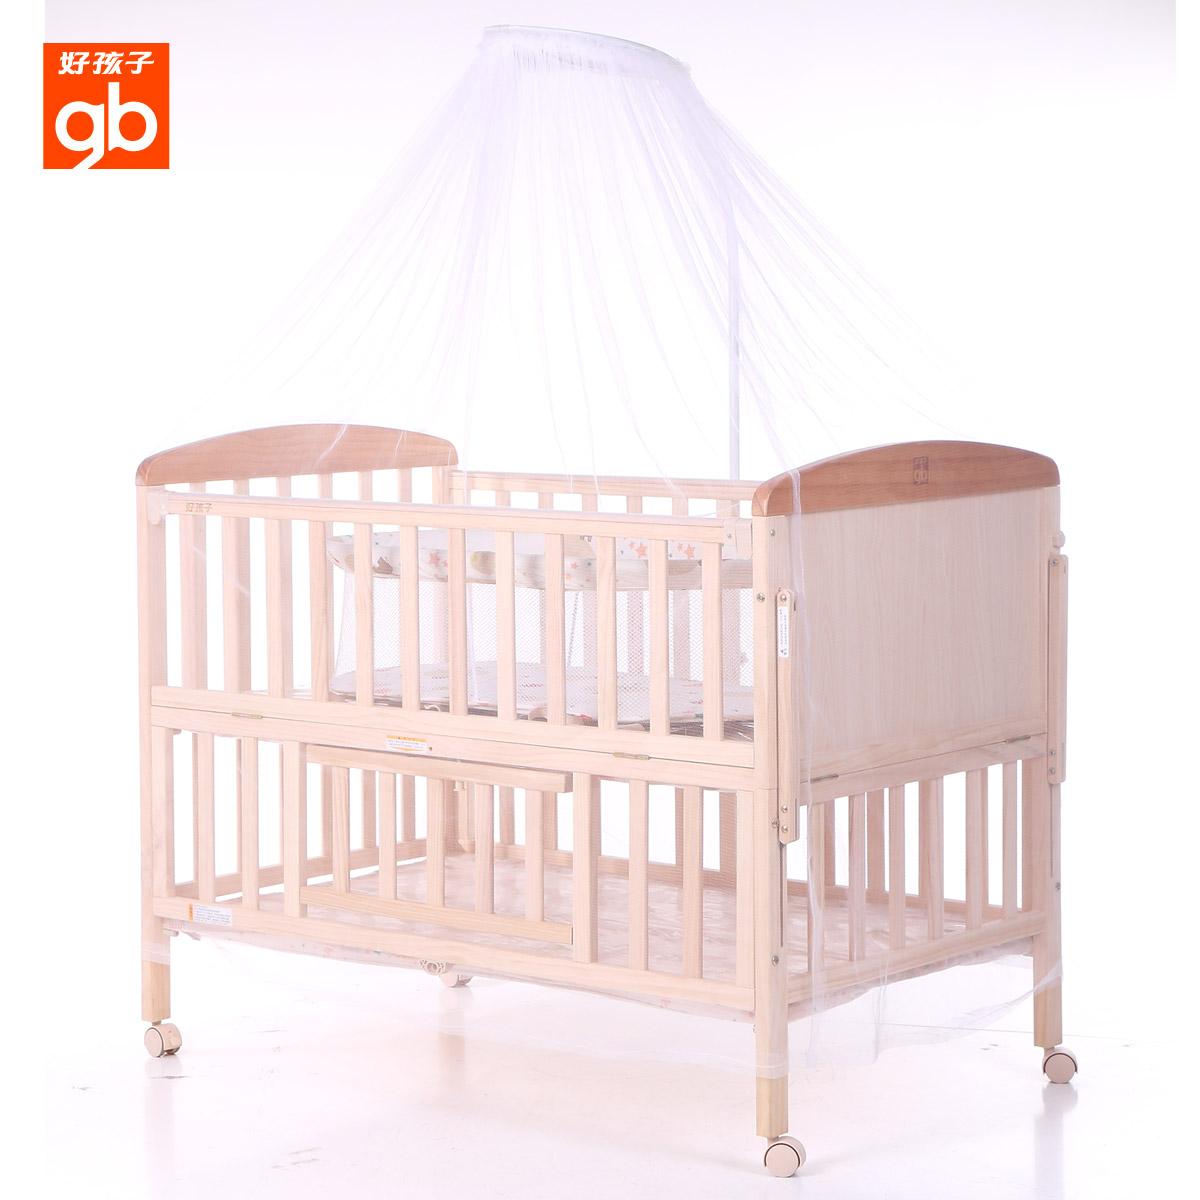 GB καλά παιδιά μωρό κρεβάτι ξύλο χωρίς μπογιά μωρό πολυλειτουργικών ββ το κρεβάτι του παιδιού το λίκνο MC283 κουνουπιέρες